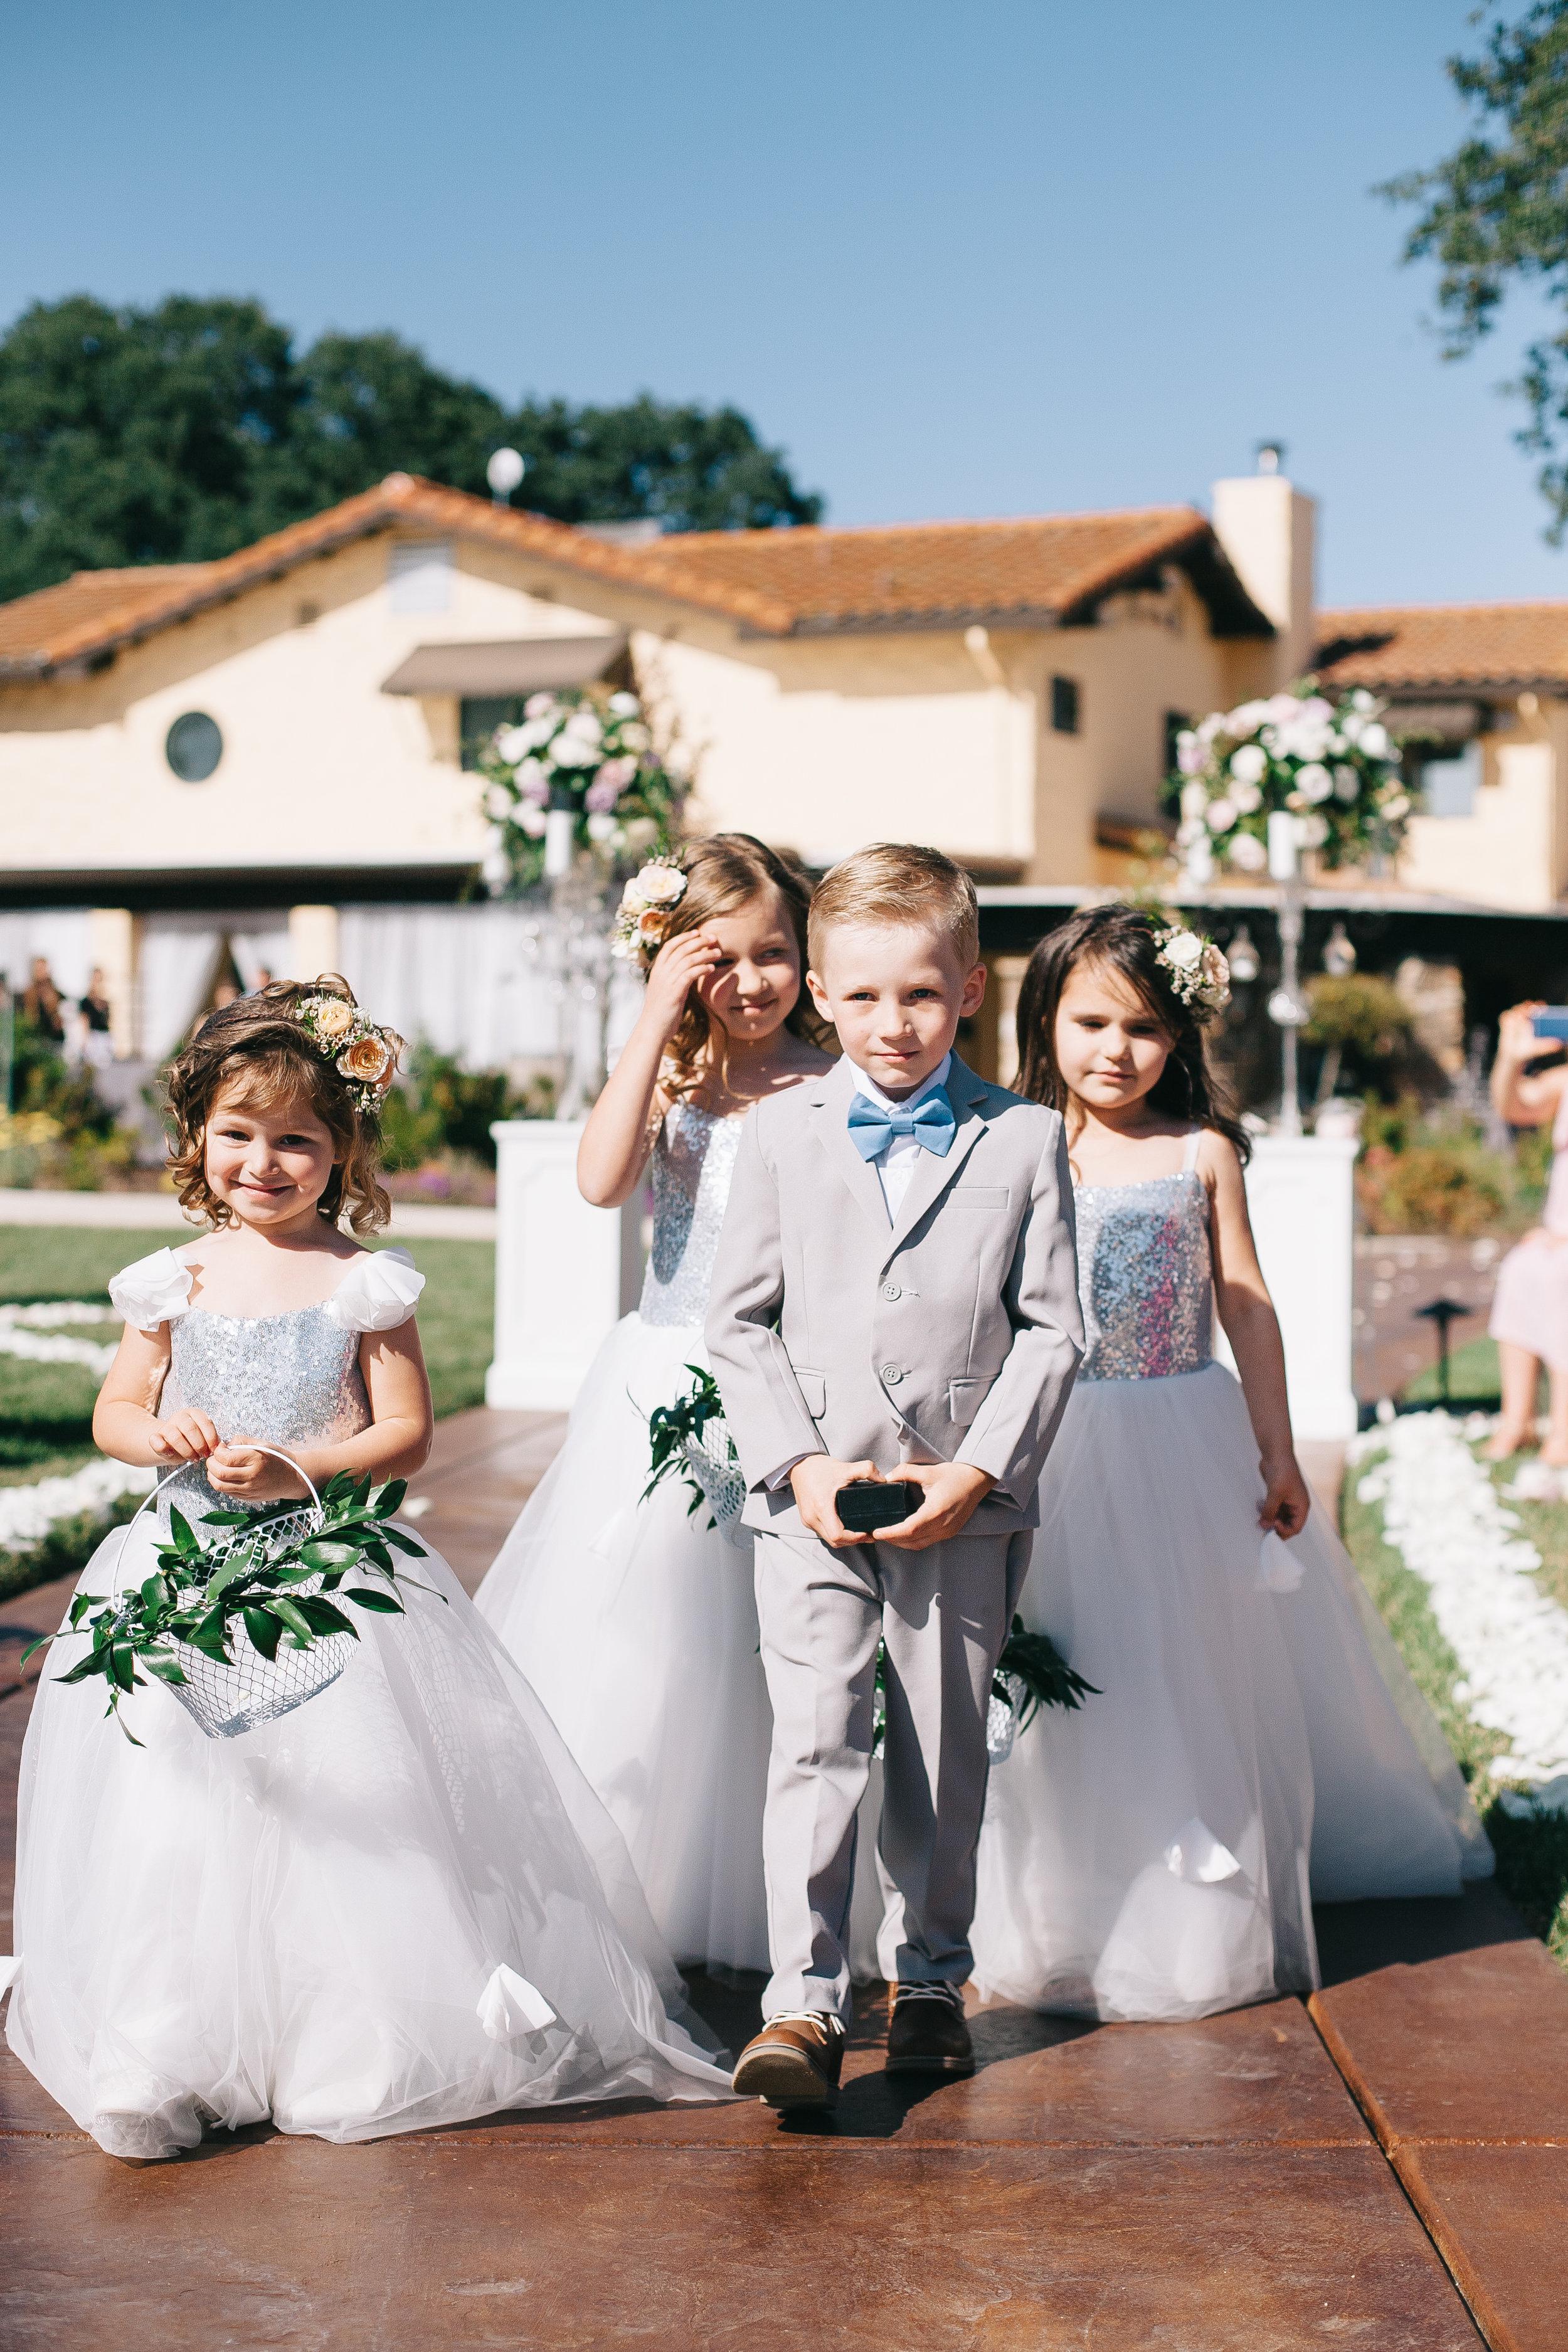 Violette-fleurs-event-design-roseville-anna-perevertaylo-rancho-robles-vinyards-Detail-Bride-groom-Flowers-Decor.jpg